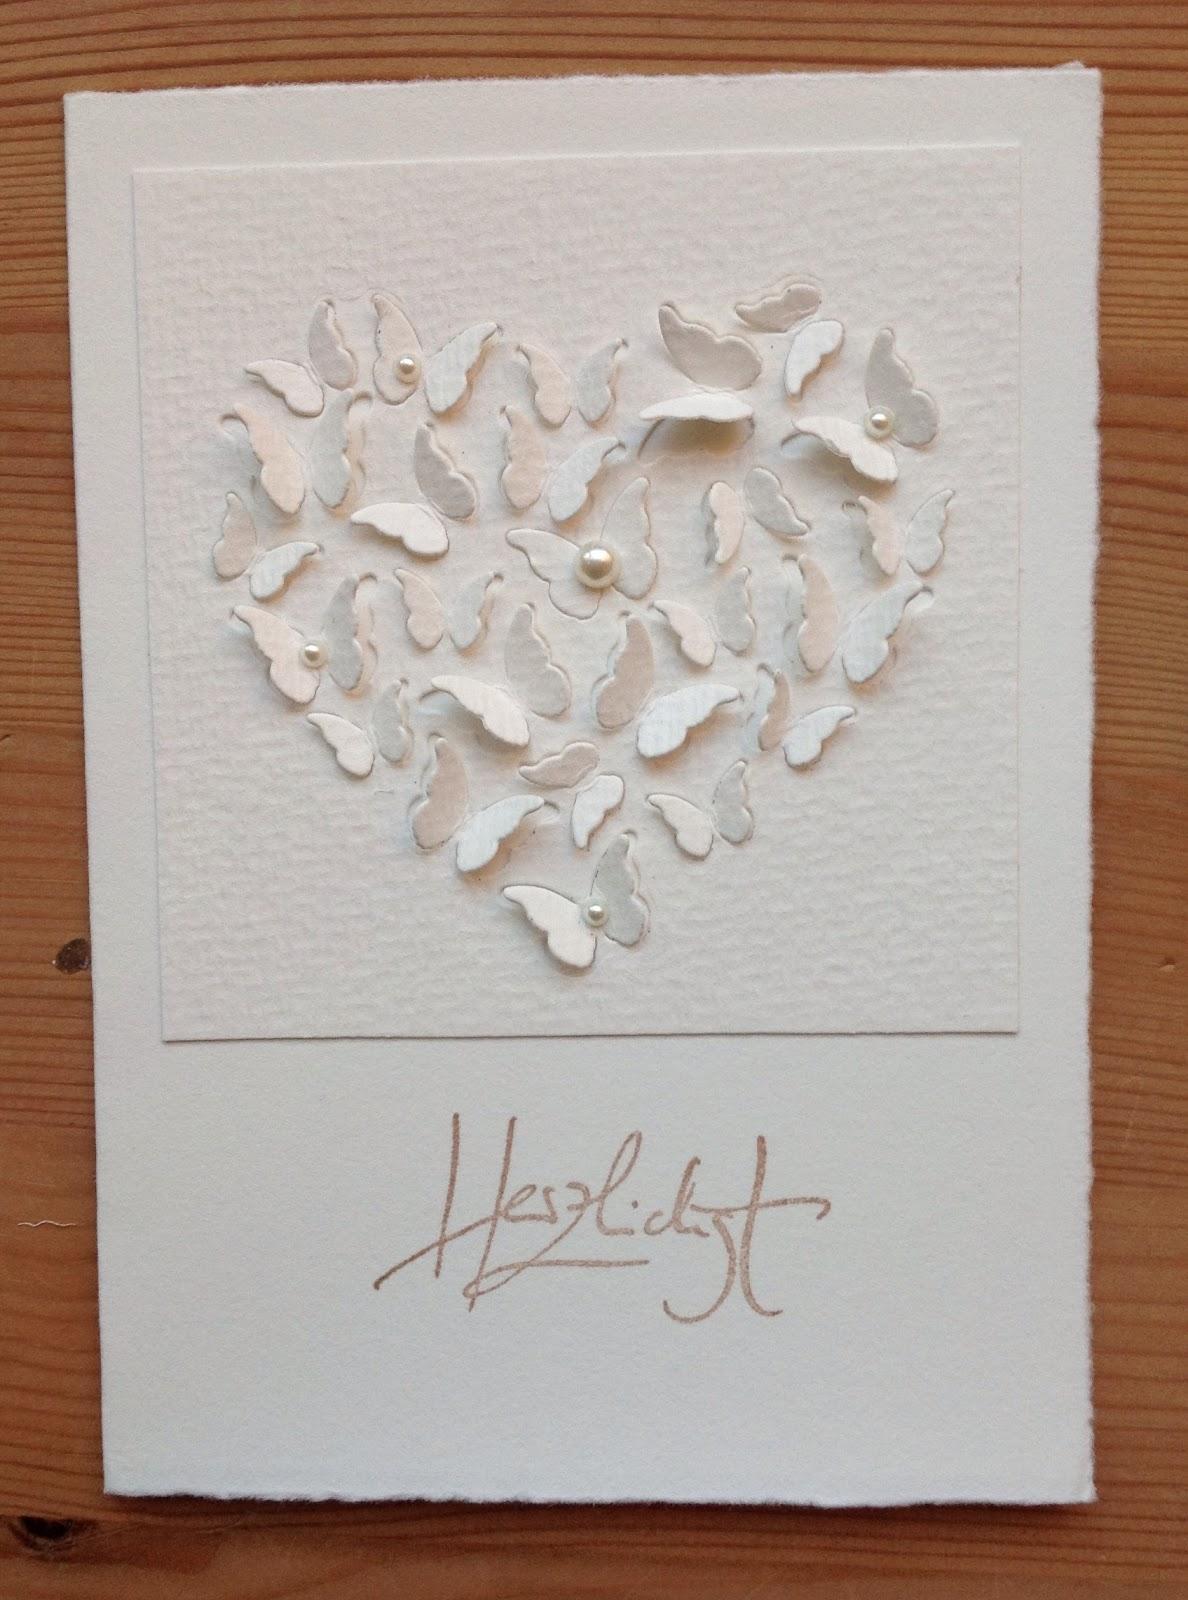 Memory Box Stanzform Herz & Schmetterlinge, Schriftstempel Alexandra Renke